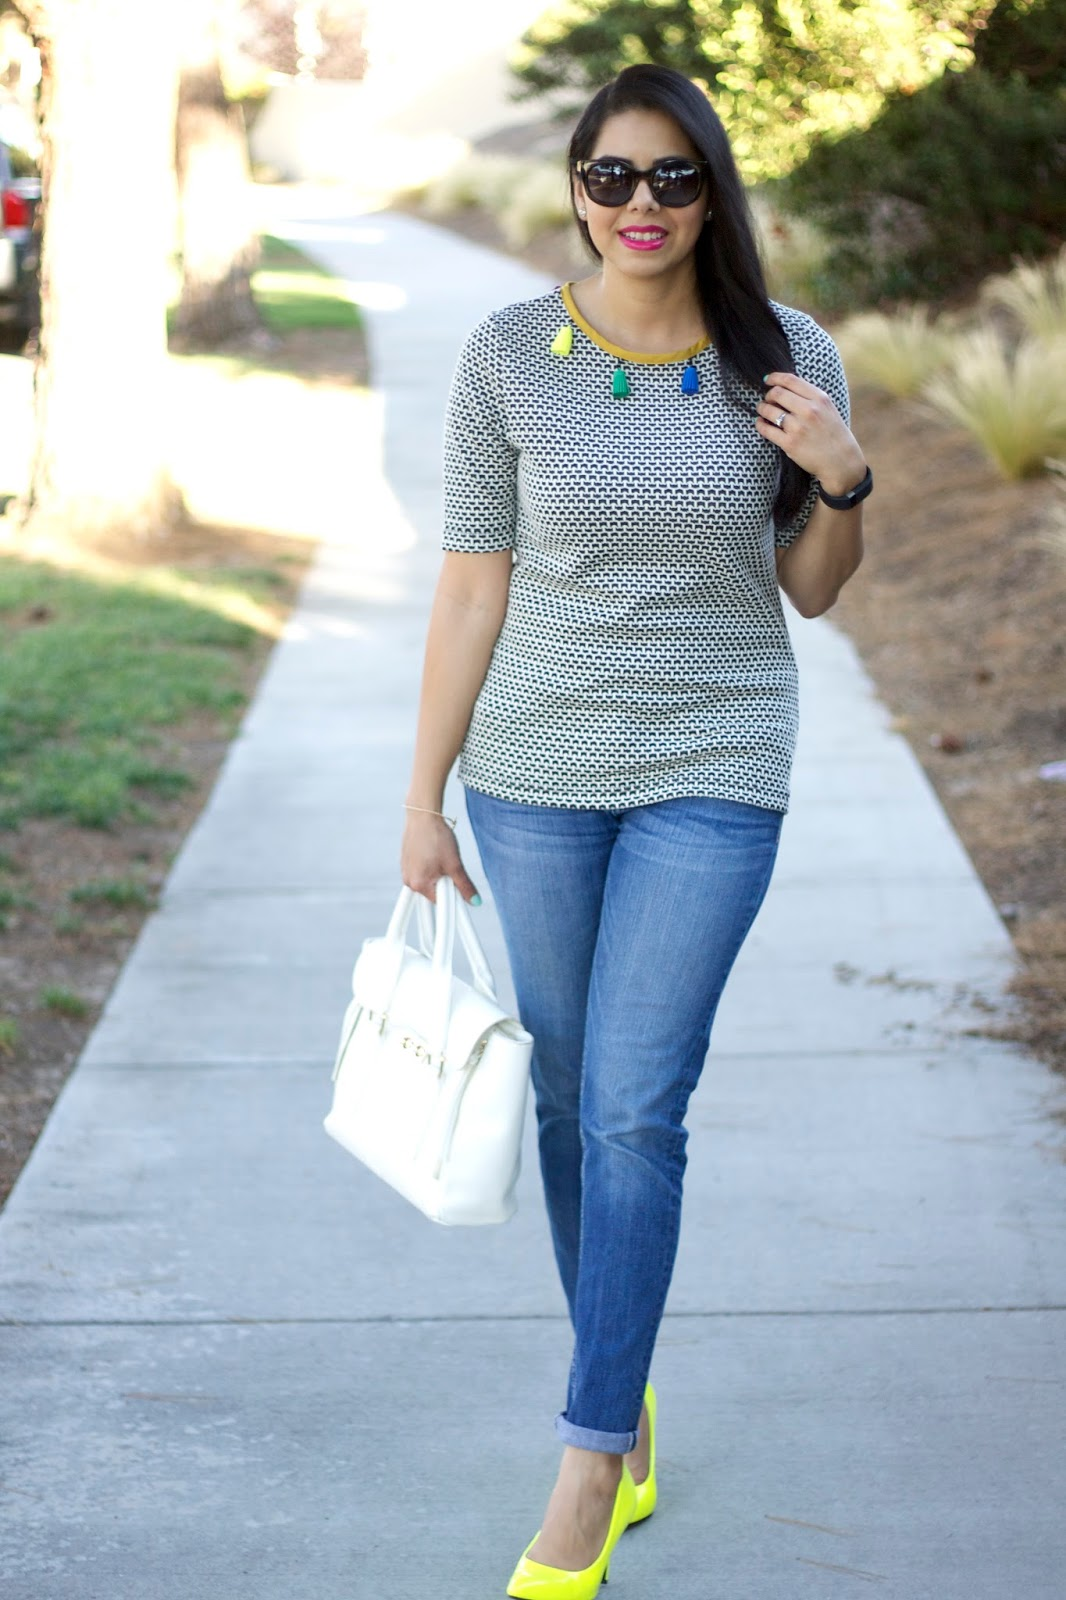 Shabby Apple Tassel Top, San Diego Fashion Blogger, How to wear tassels, tassel trend